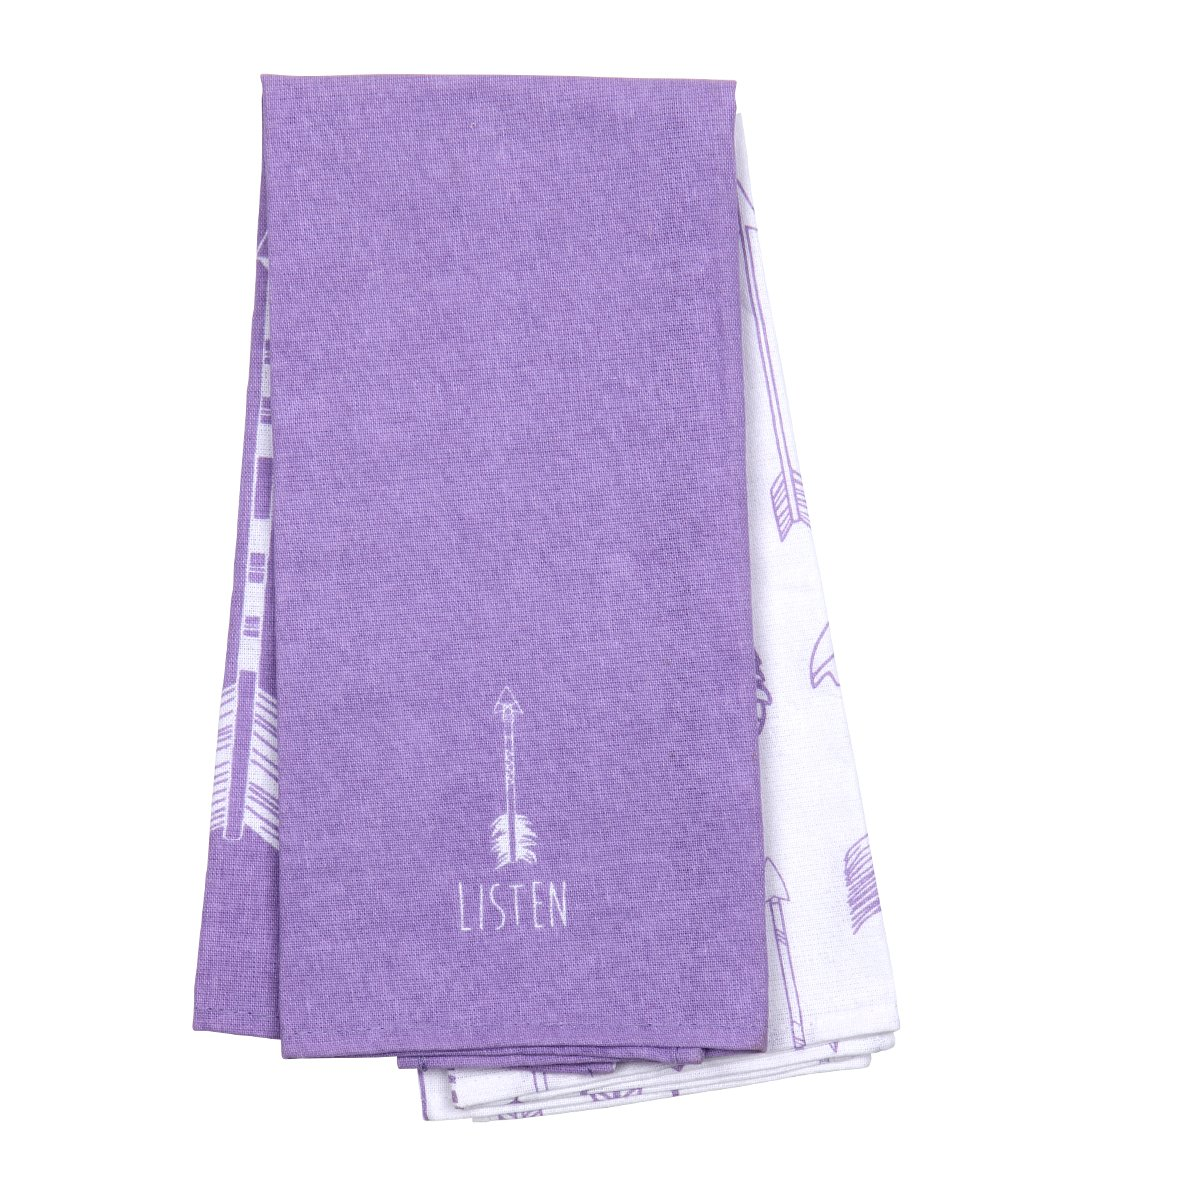 Karma Gifts Tea Towels (Set of 2), Arrows by Karma Gifts (Image #1)